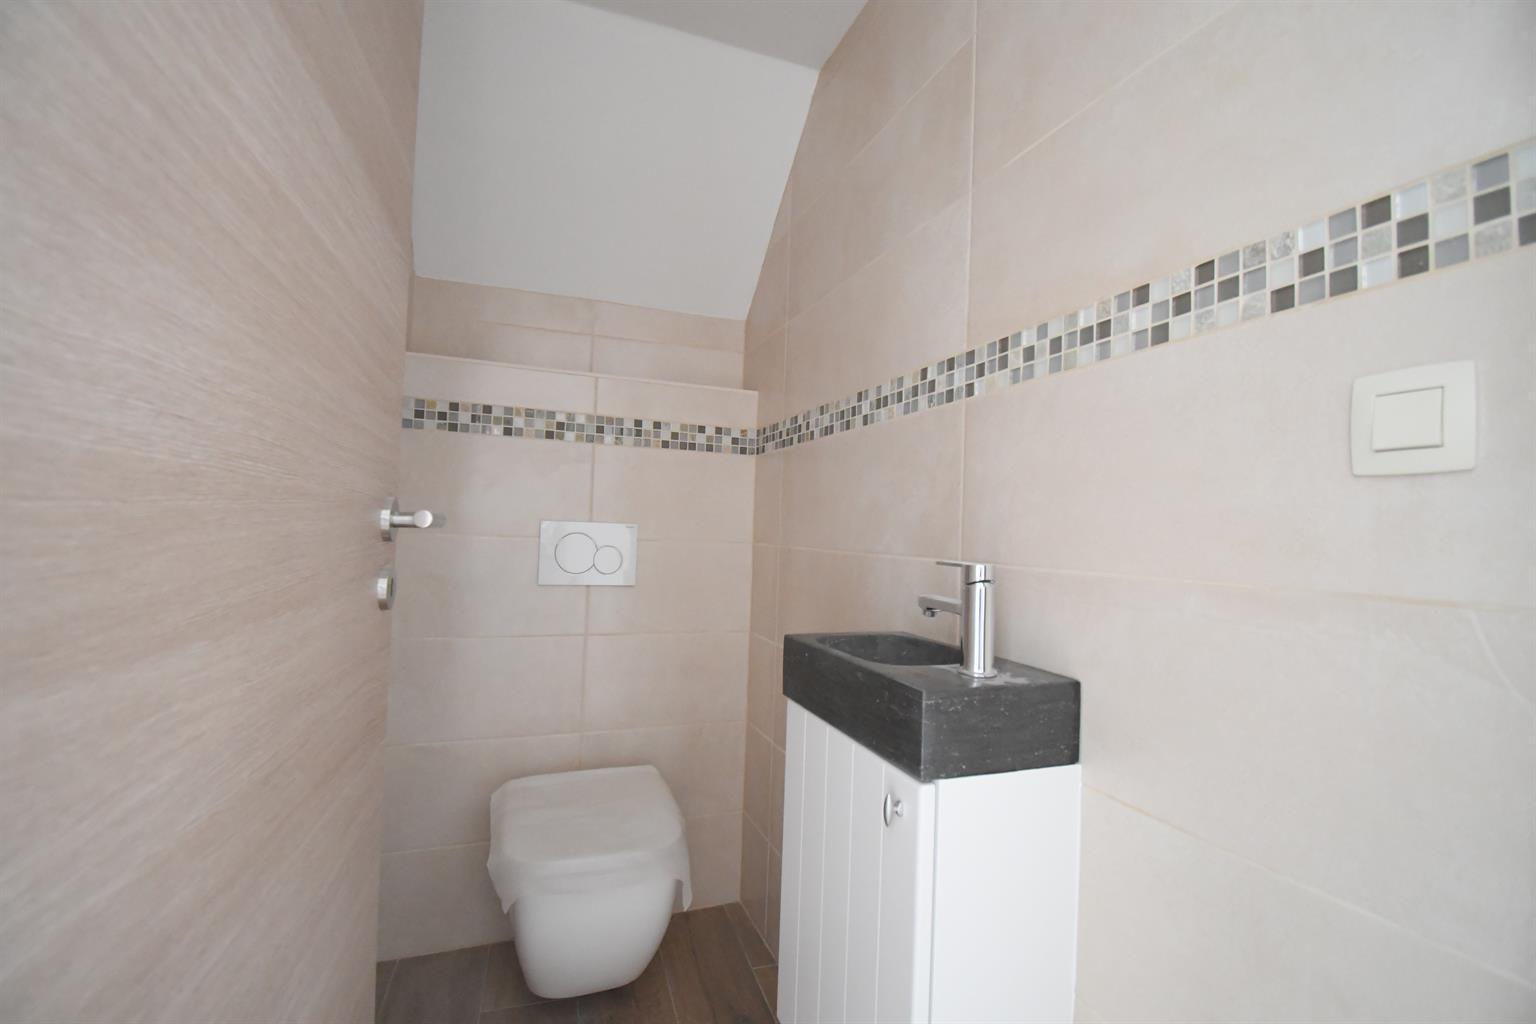 Appartement - Rebecq - #4181974-19